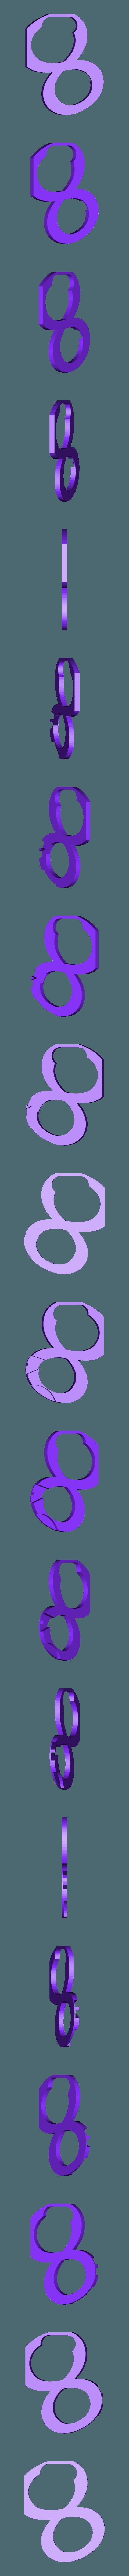 logo_100_8.stl Download free STL file iPhone6 case • Design to 3D print, tofuji